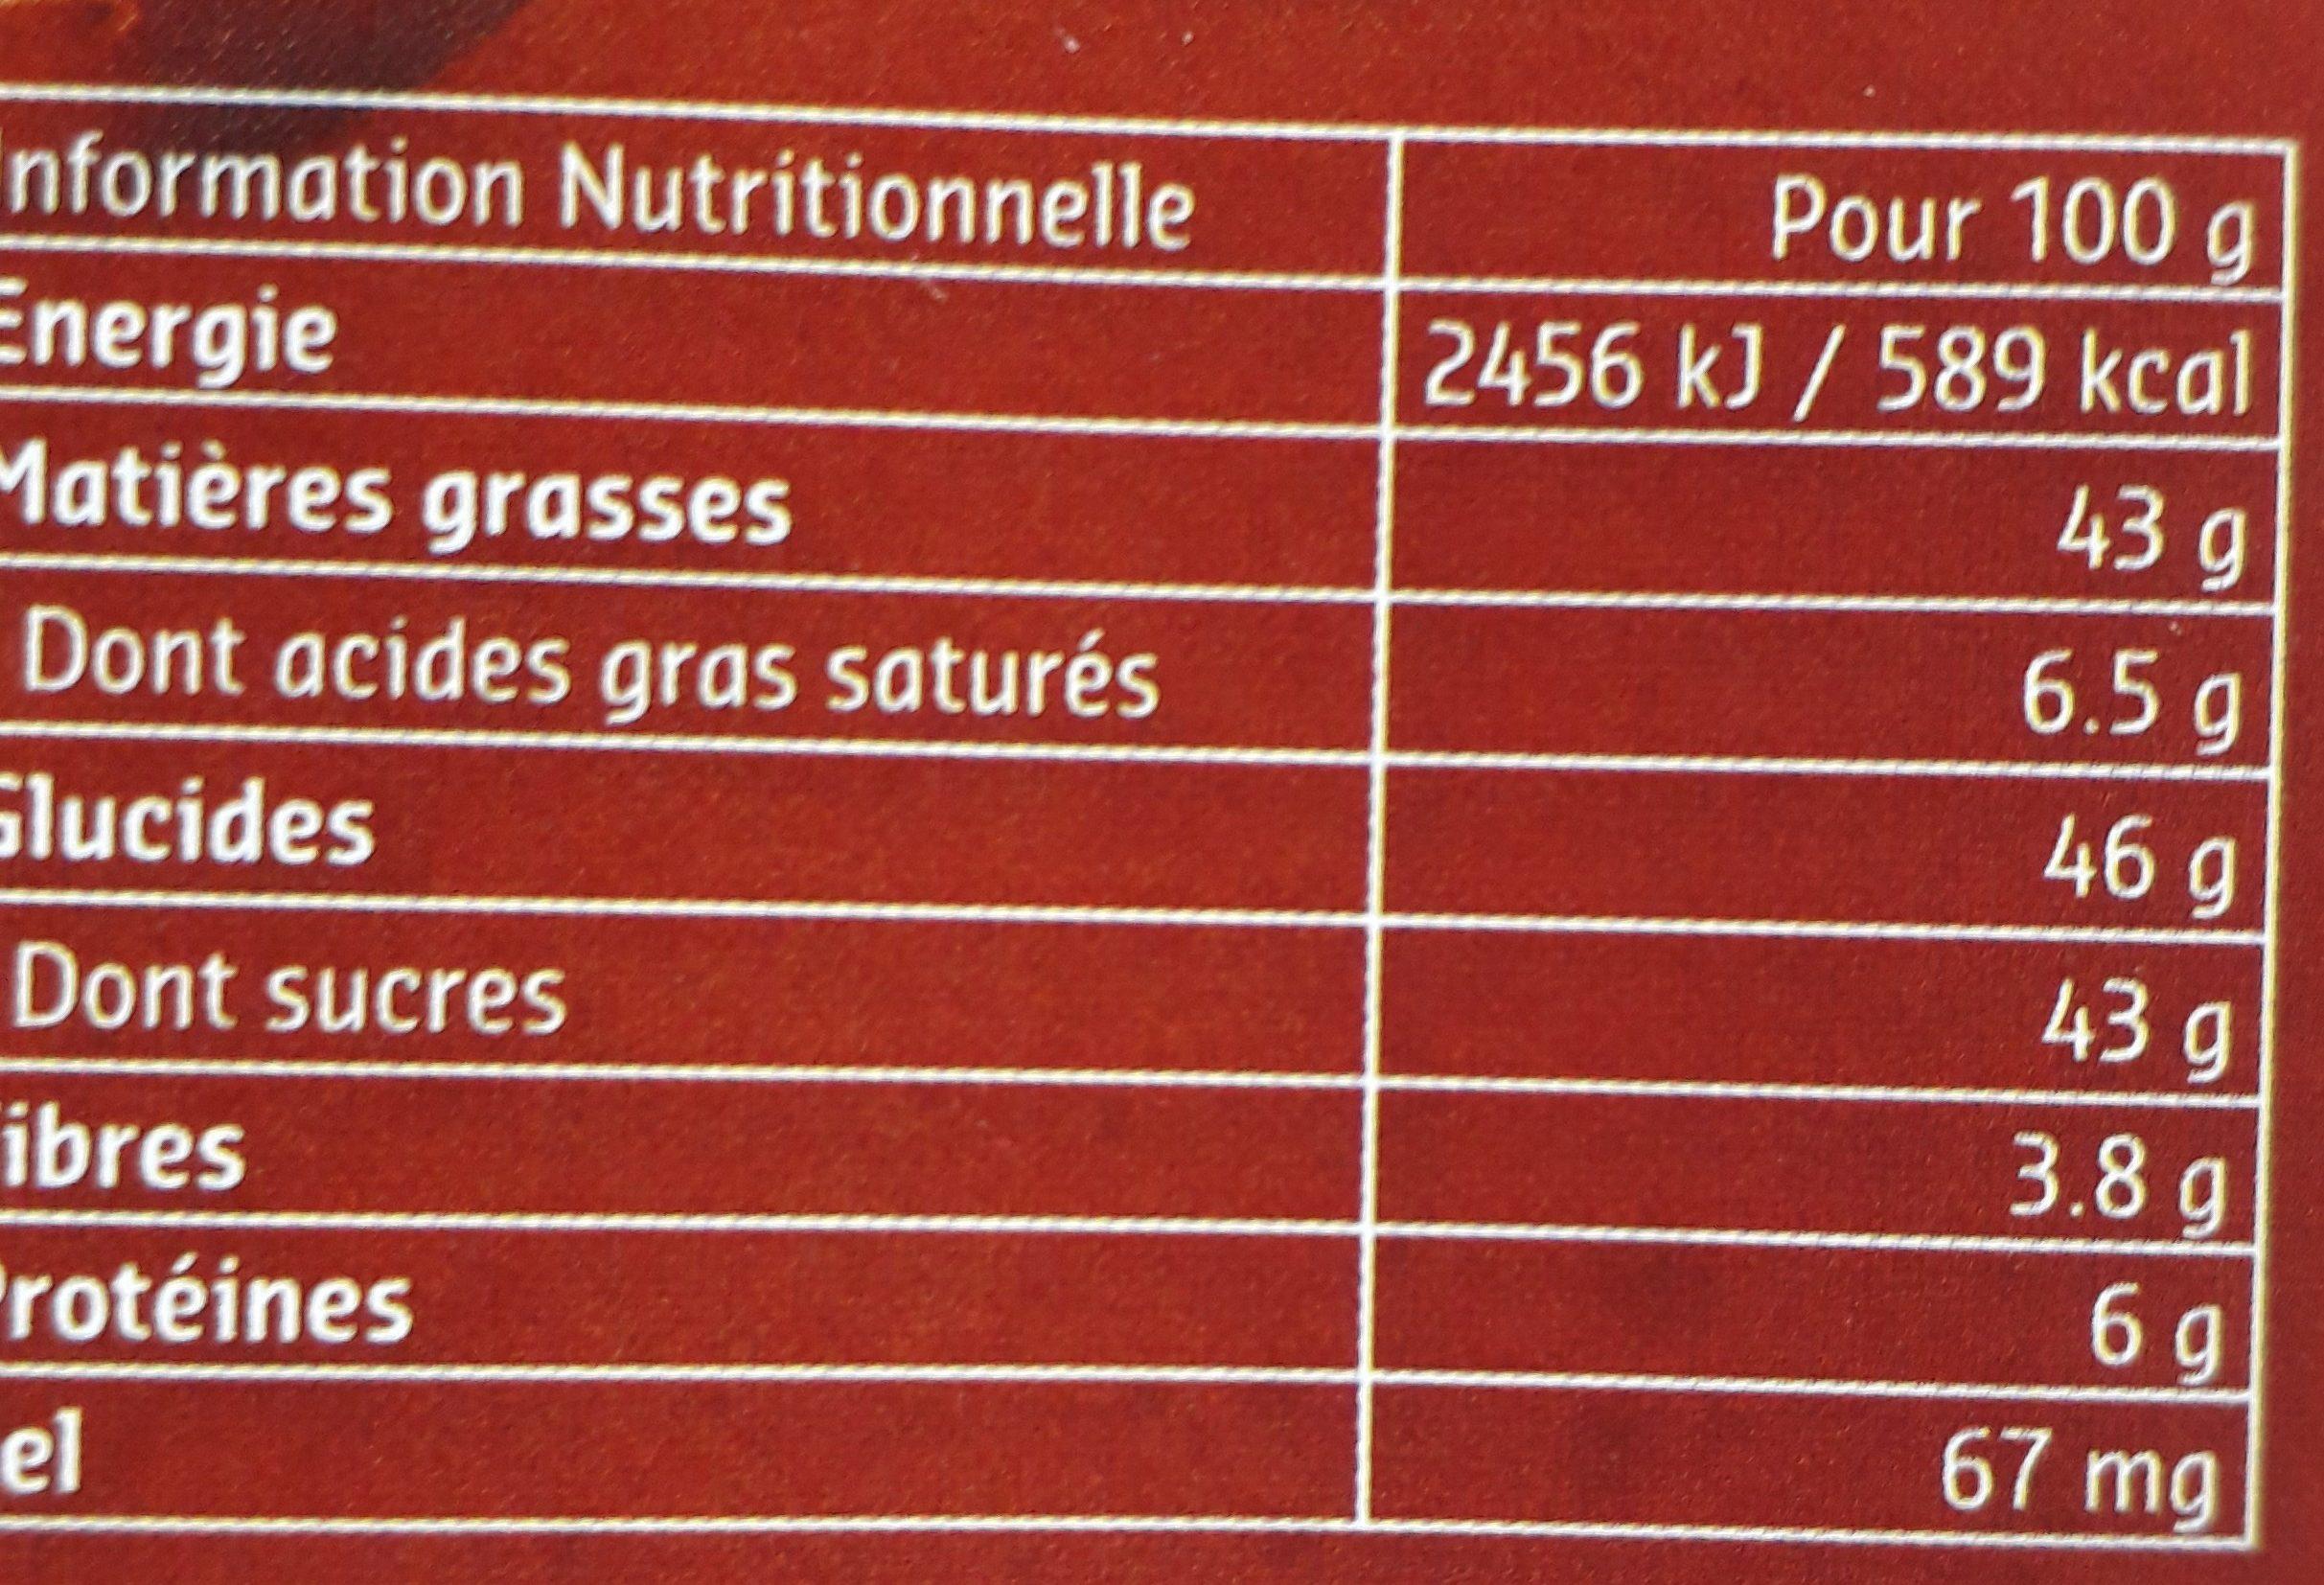 Pâte à tartiner fluide - Valori nutrizionali - fr